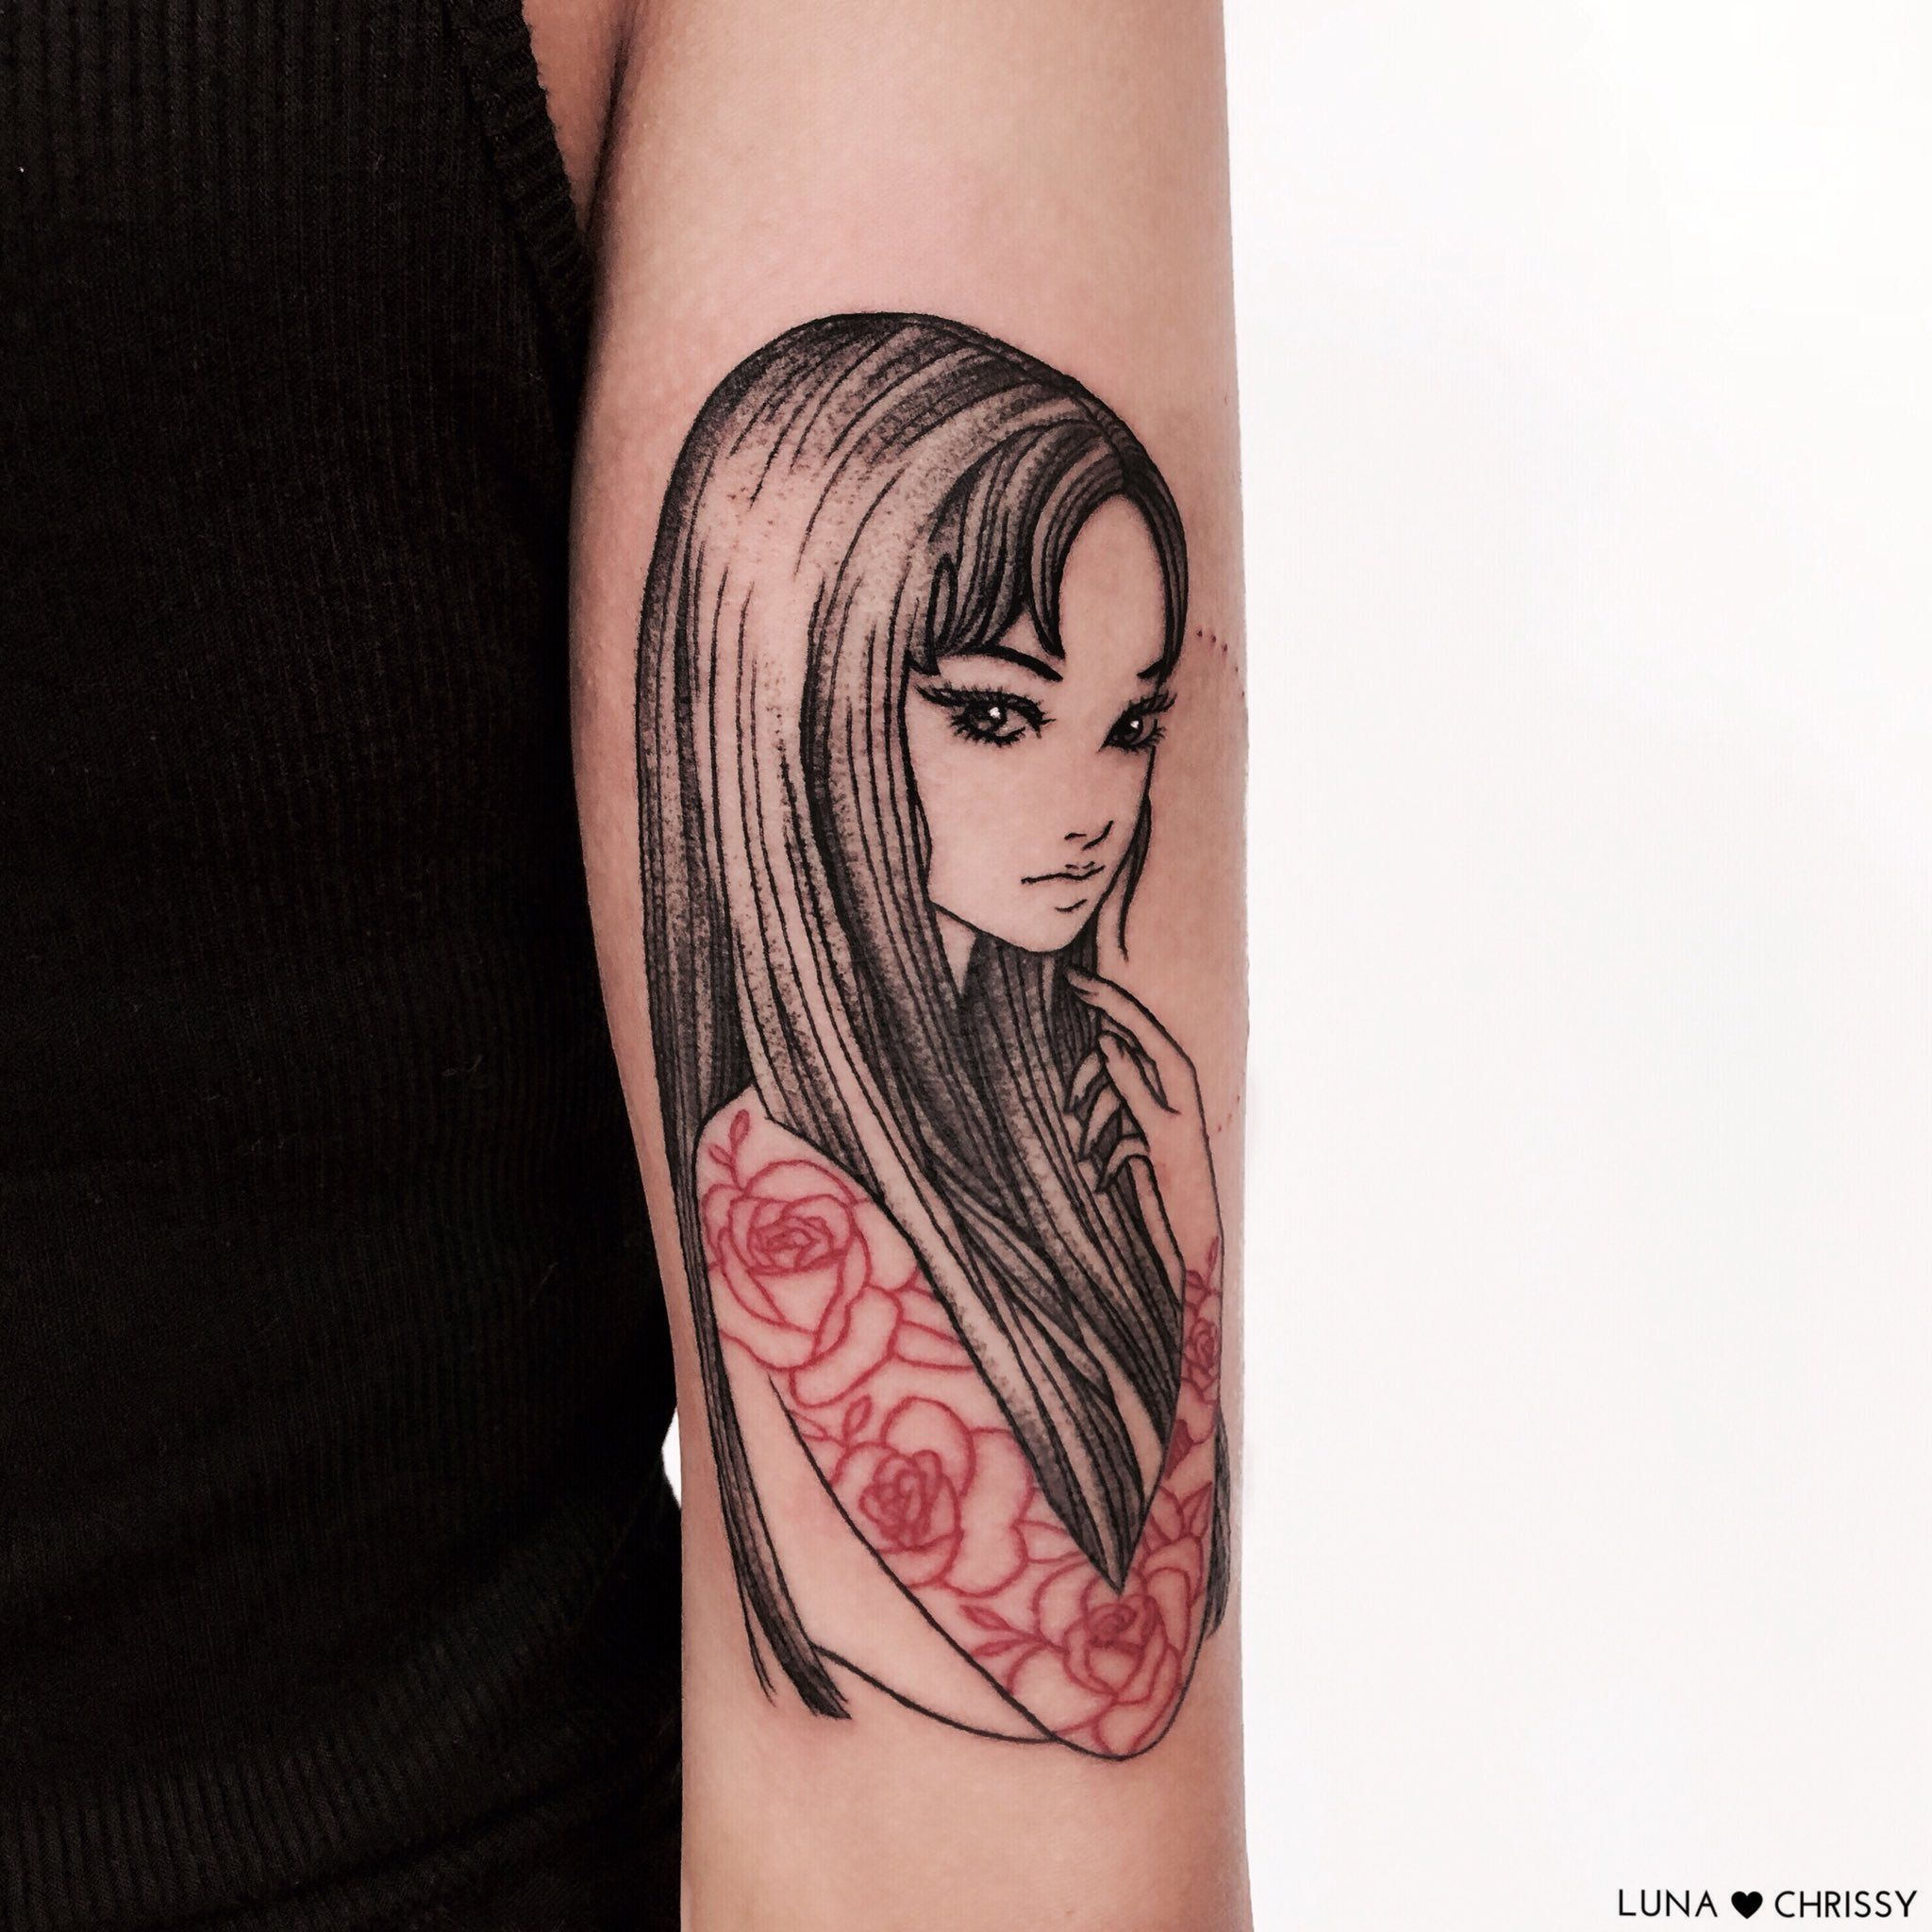 Chrissy on red ink tattoos body art tattoos black